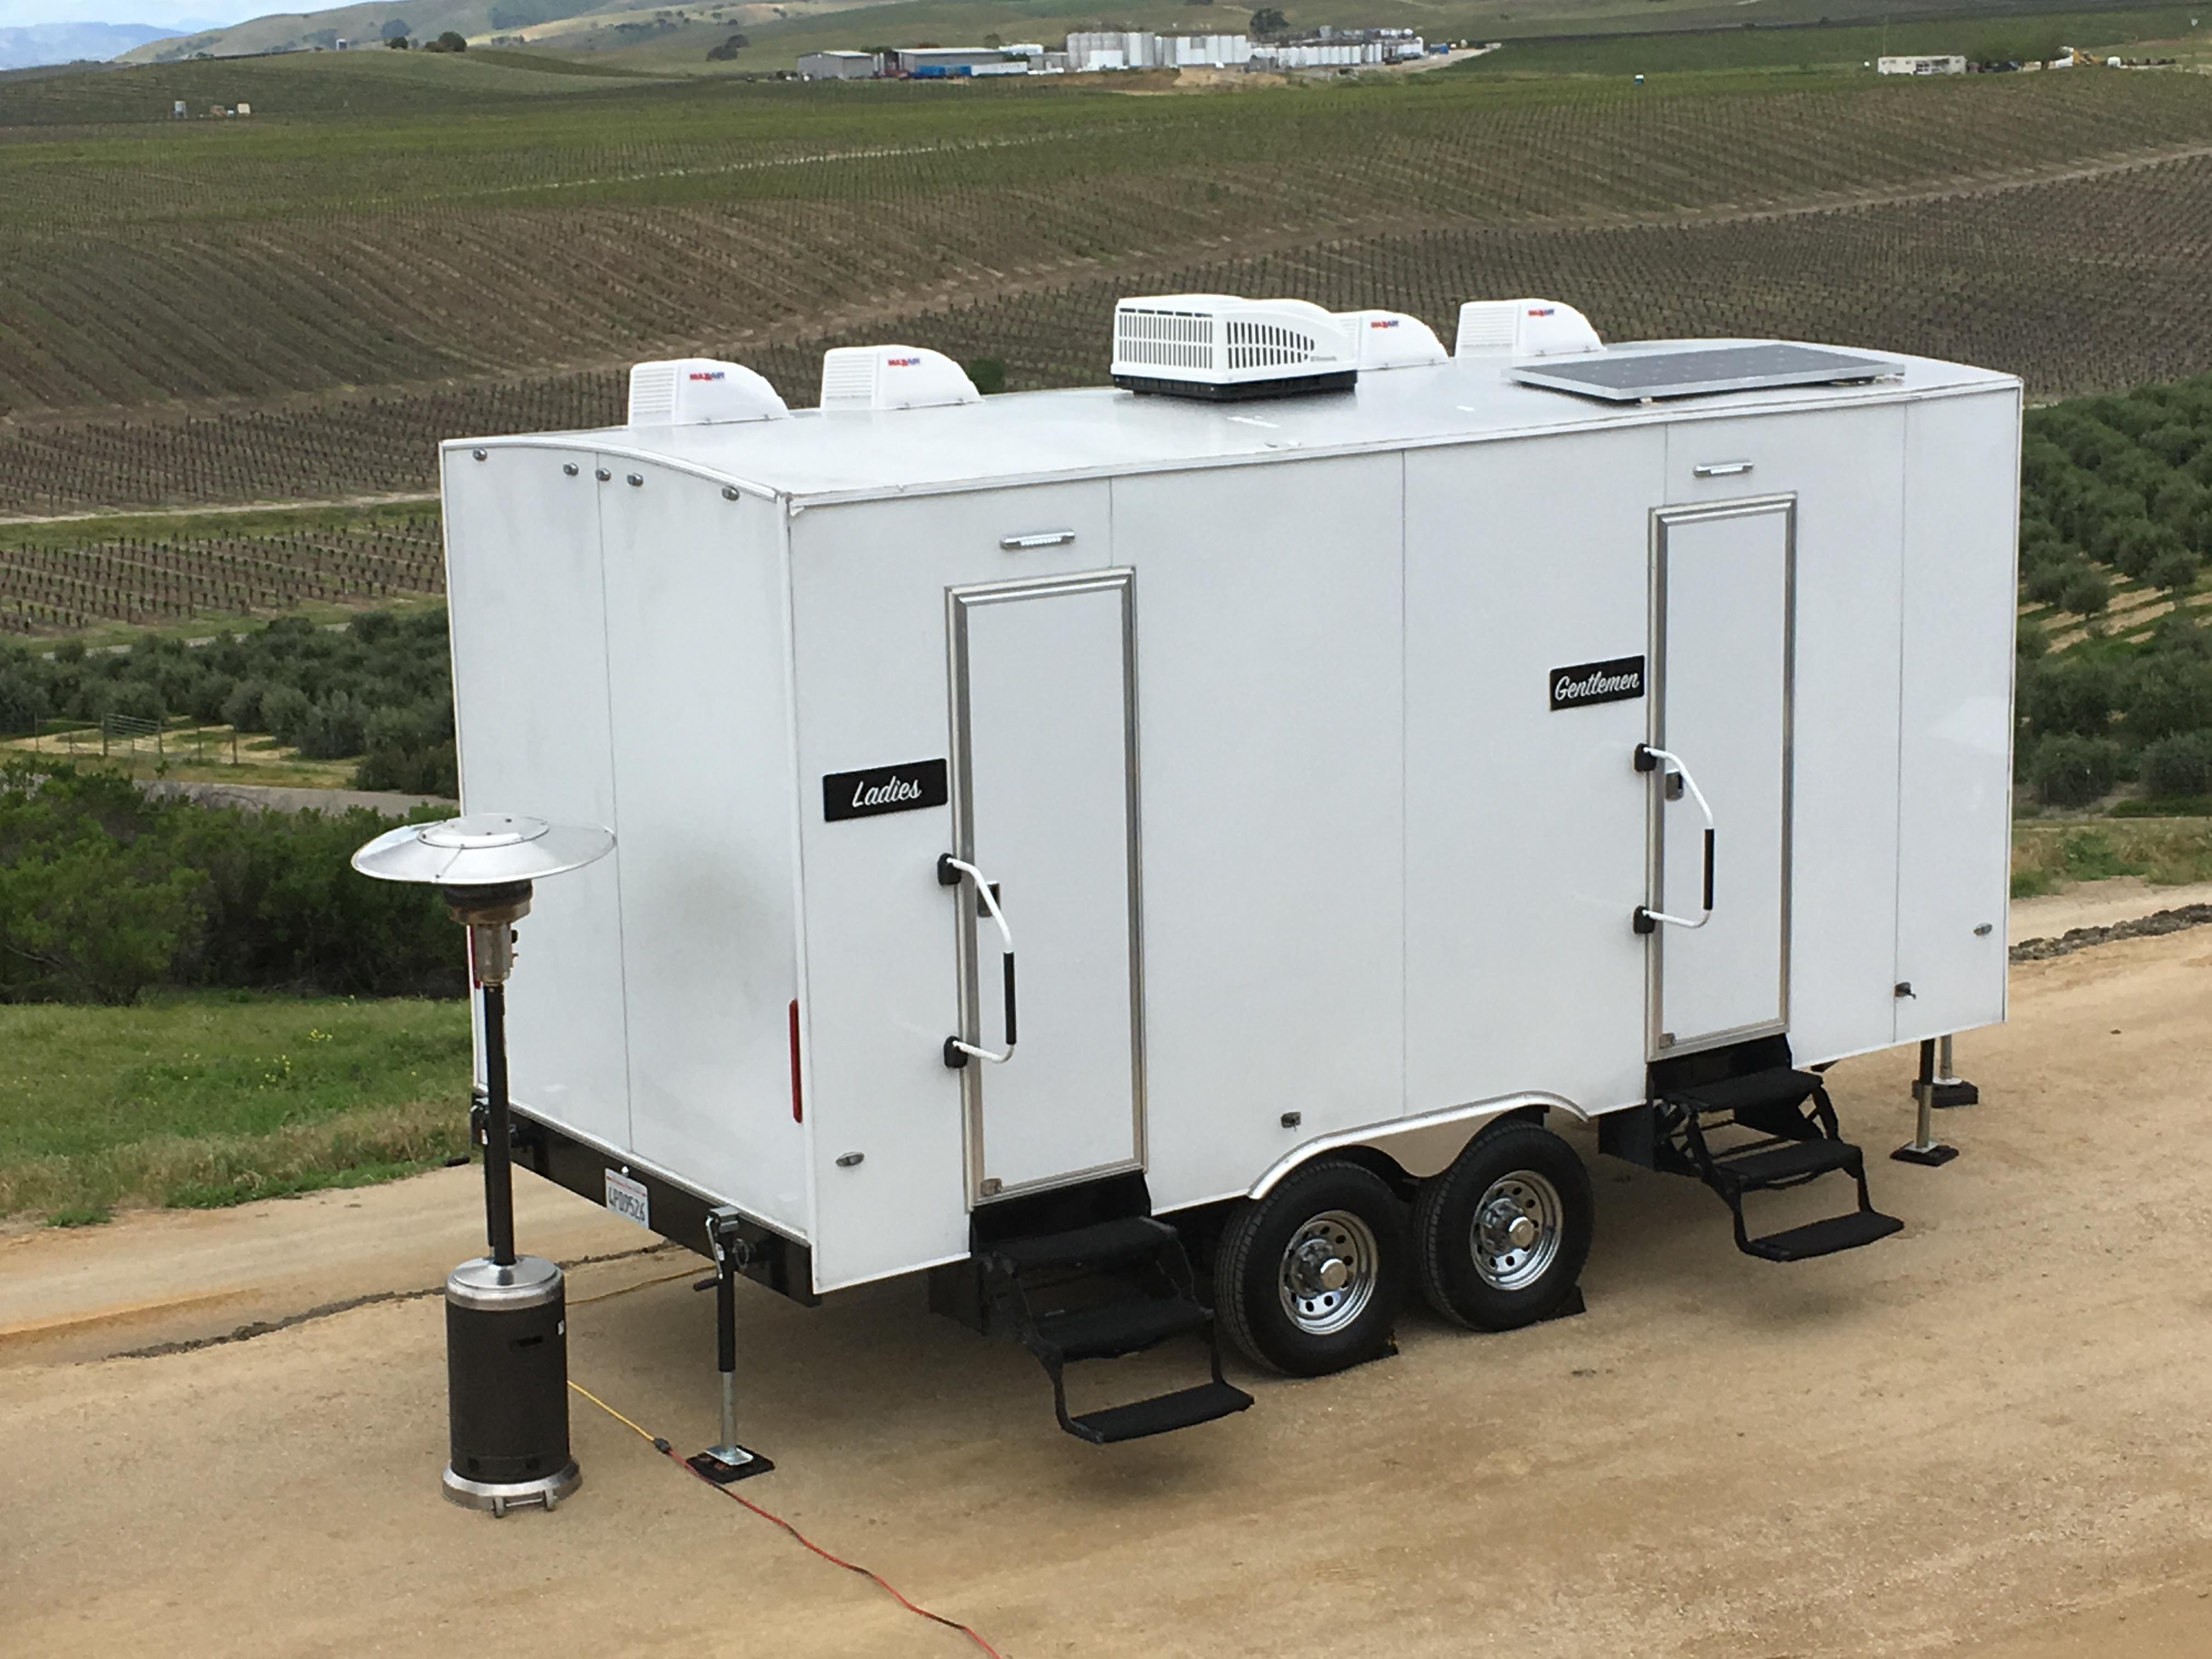 Meraz luxury rentals luxury portable restroom trailers for Portable bathroom trailers